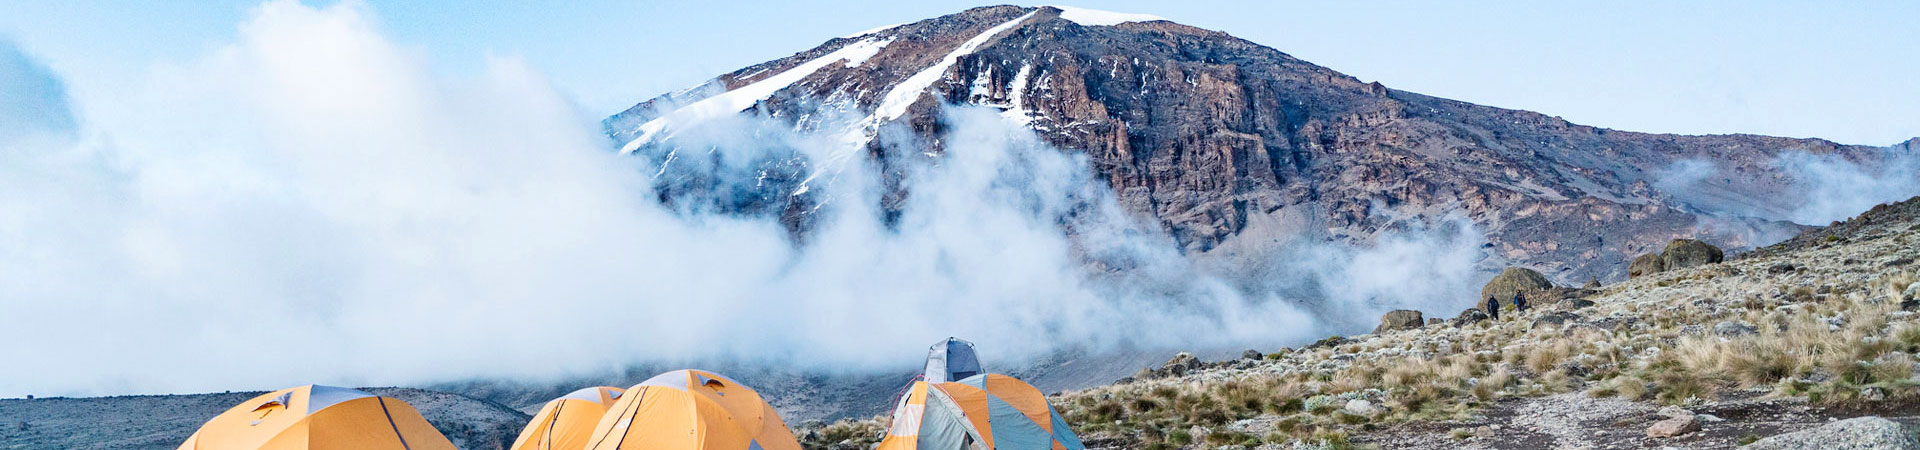 7-Days-Climbing-Kilimanjaro--Machame-Route.